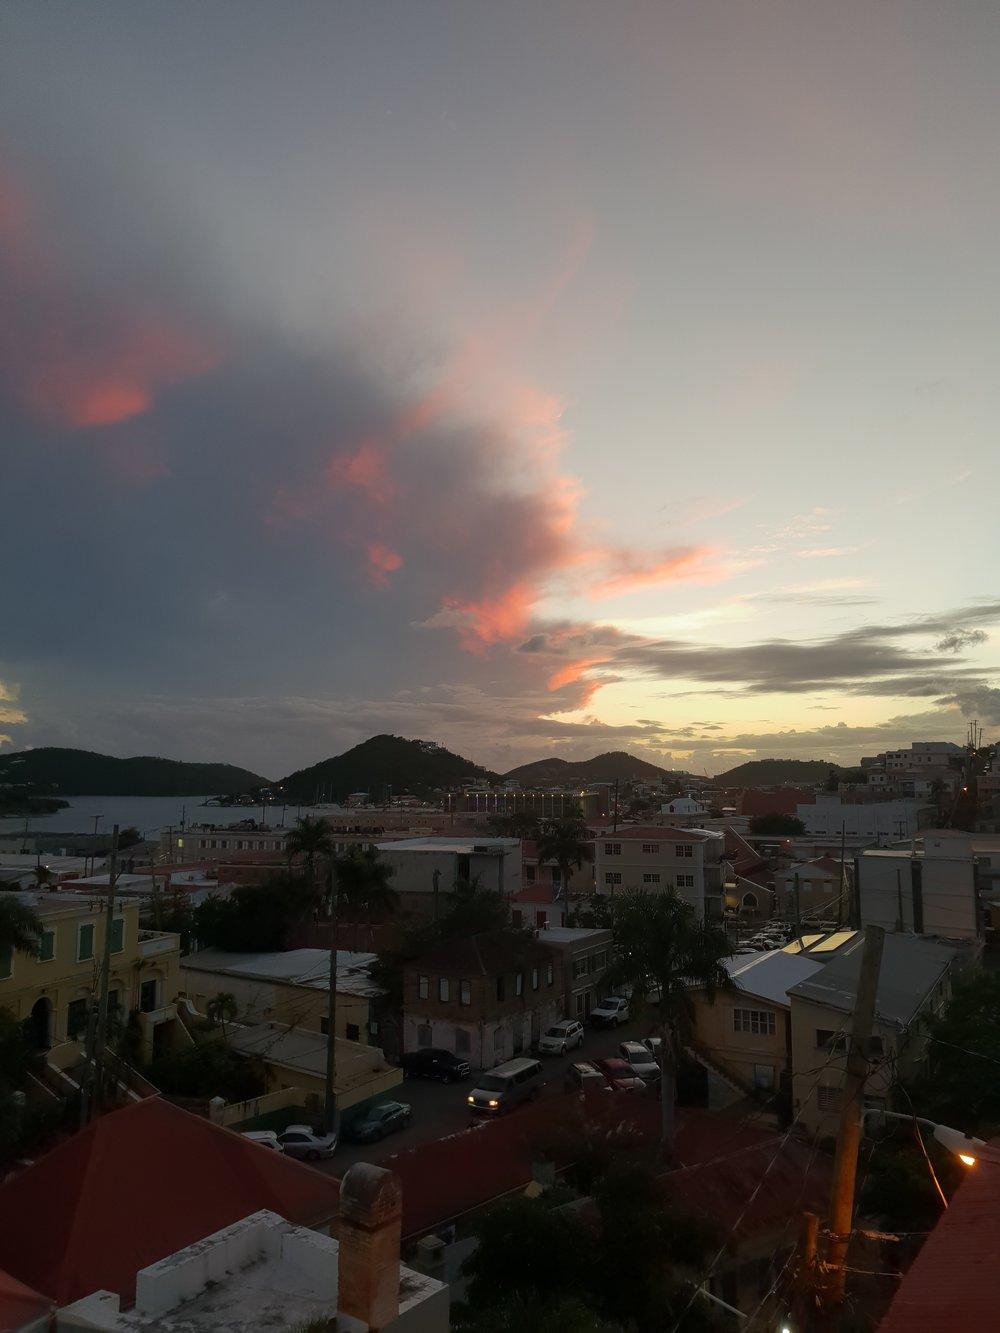 Nighttime in Charlotte Amalie, St Thomas